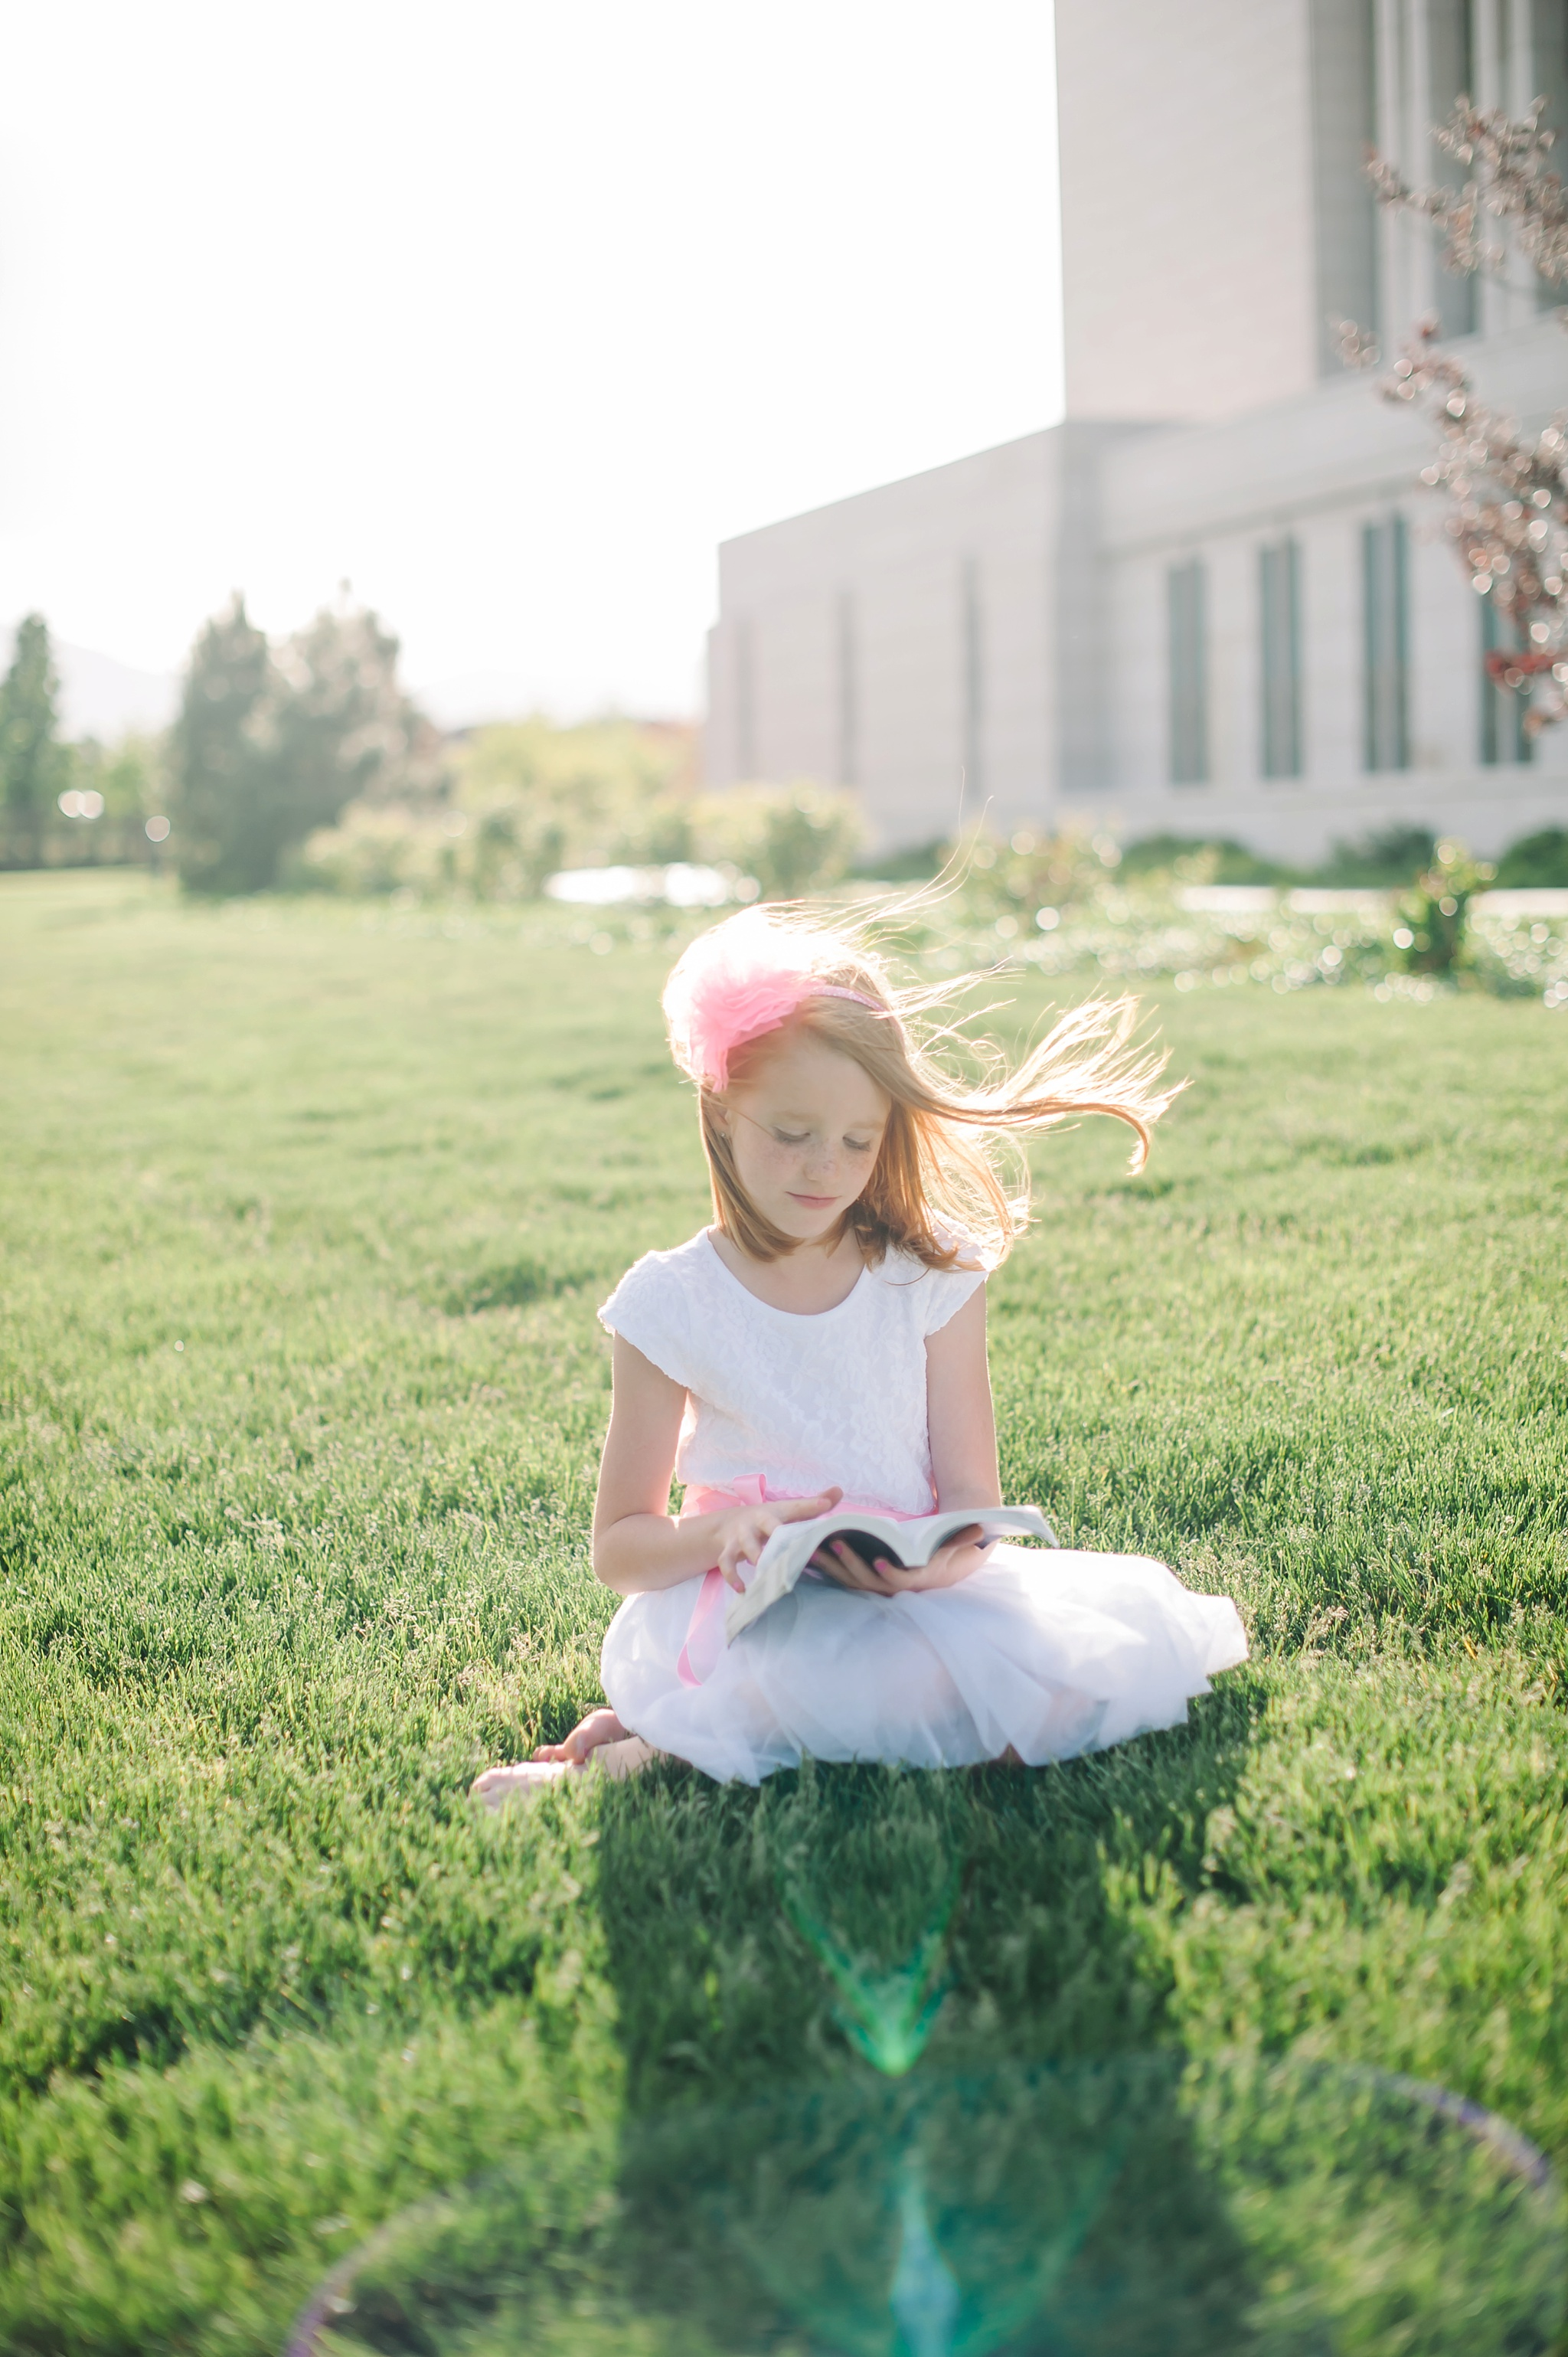 Utah Salt Lake Family Photographer Ali Sumsion 078